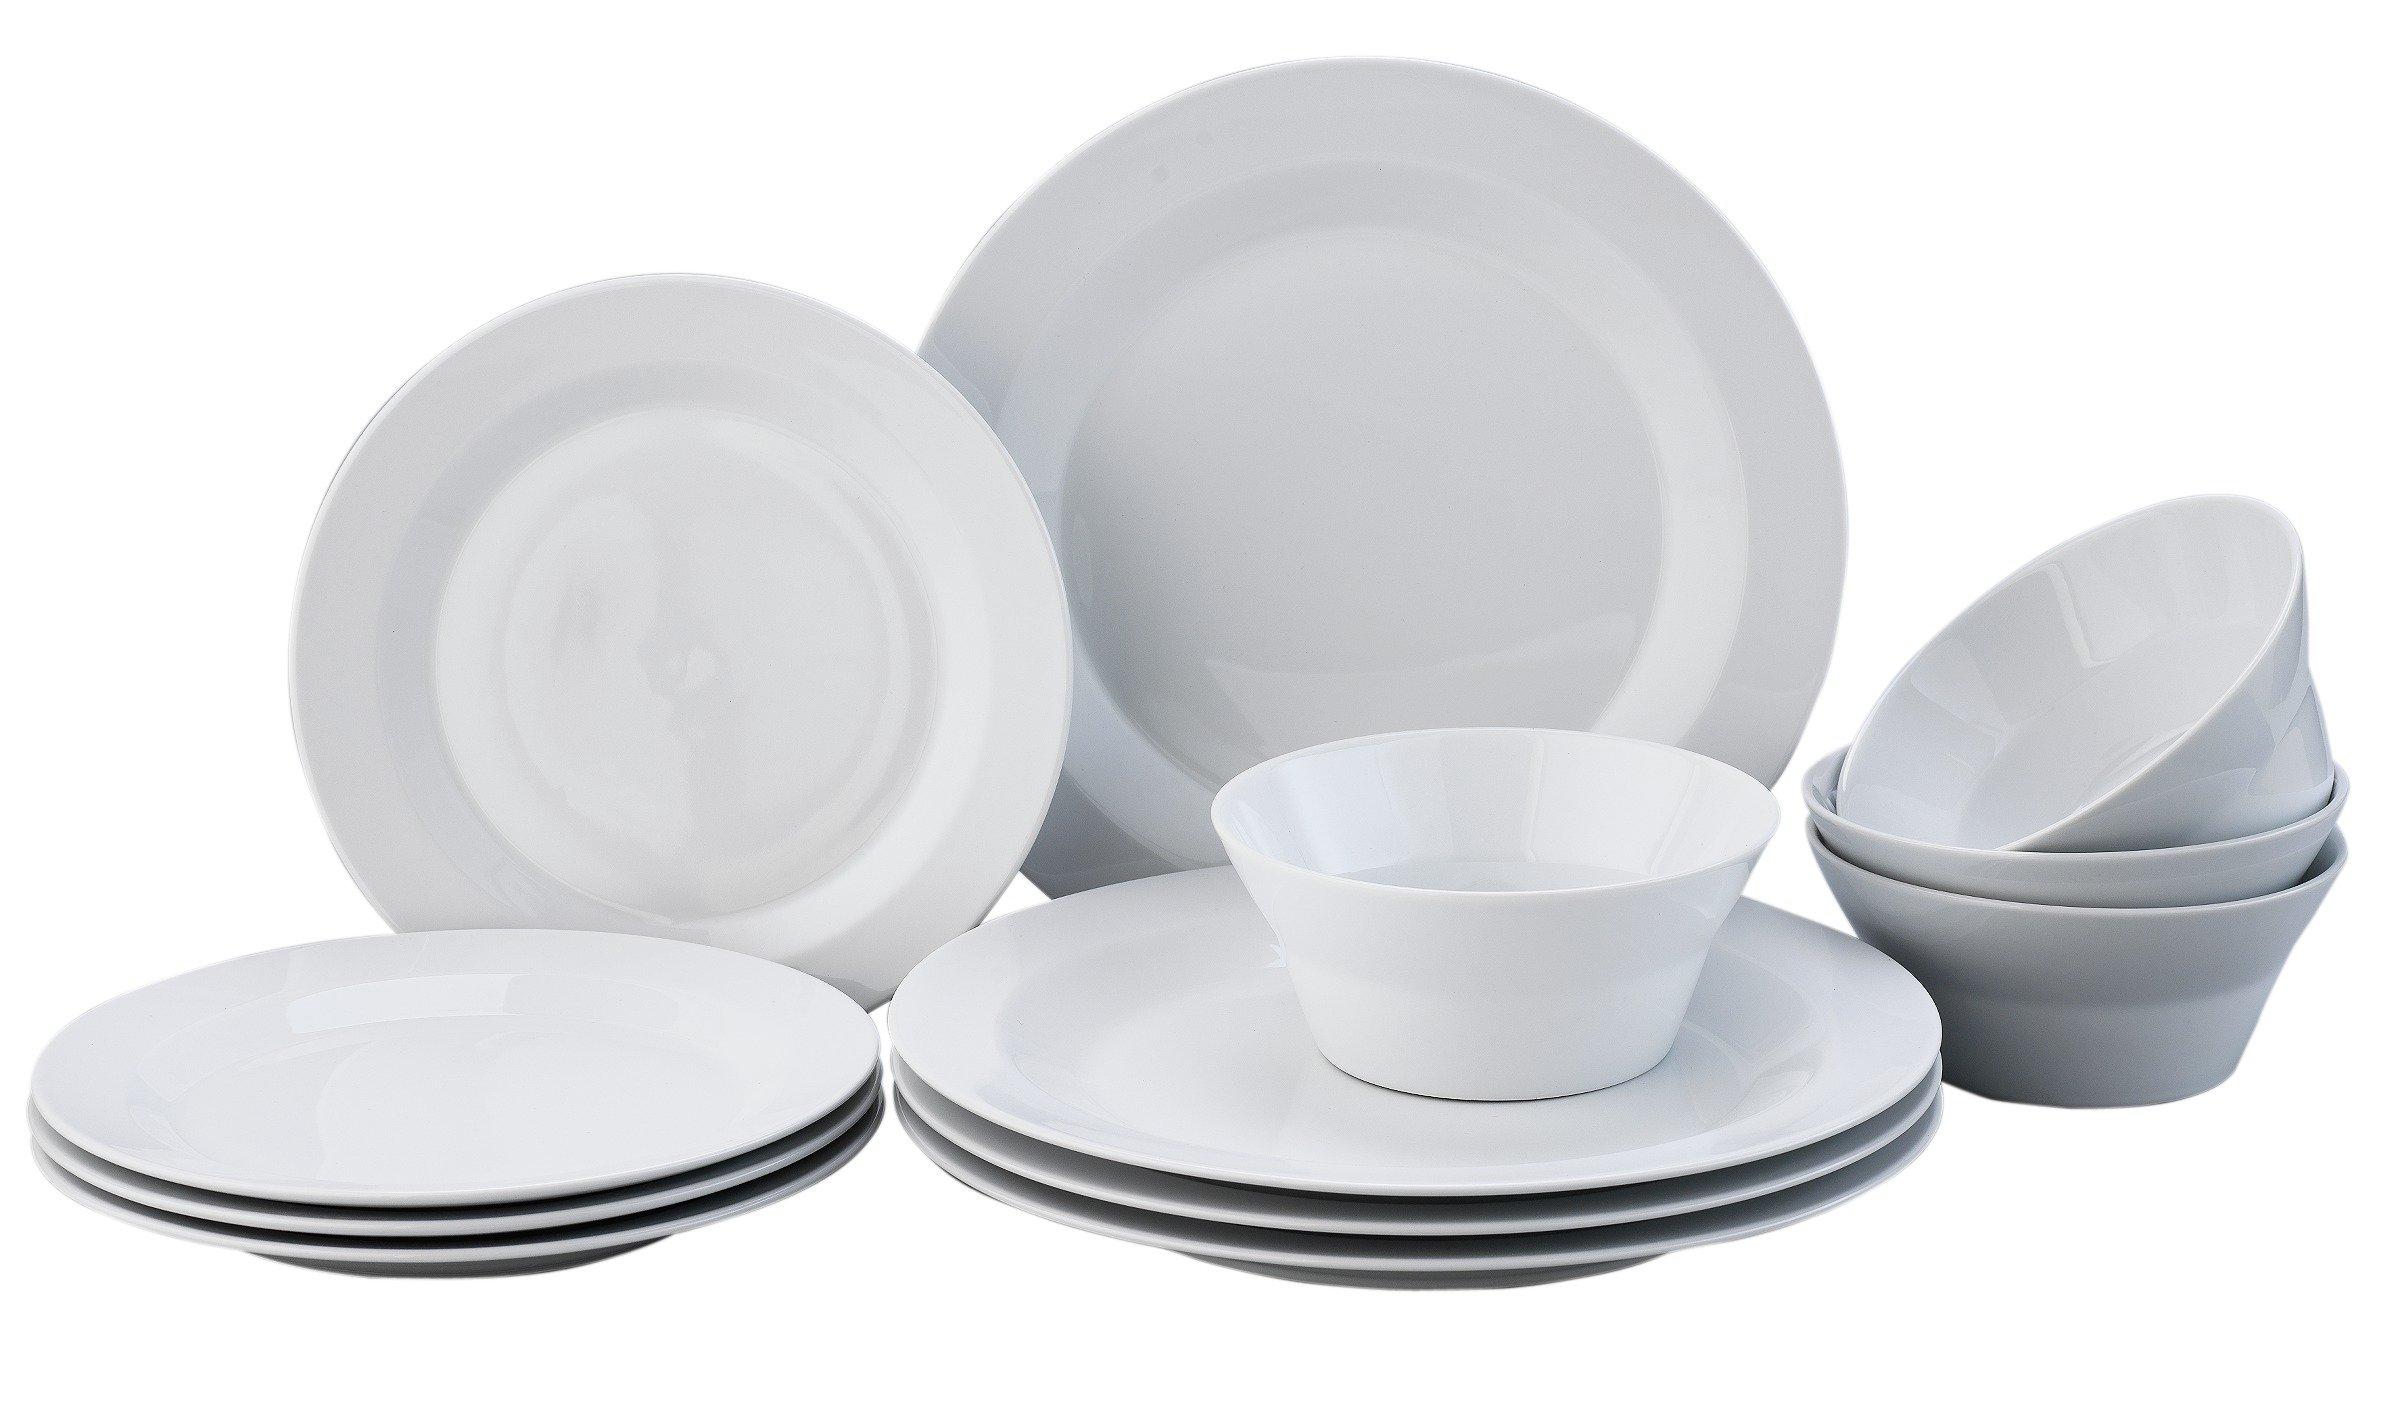 Denby James Martin 12 Piece Porcelain Dinner Set